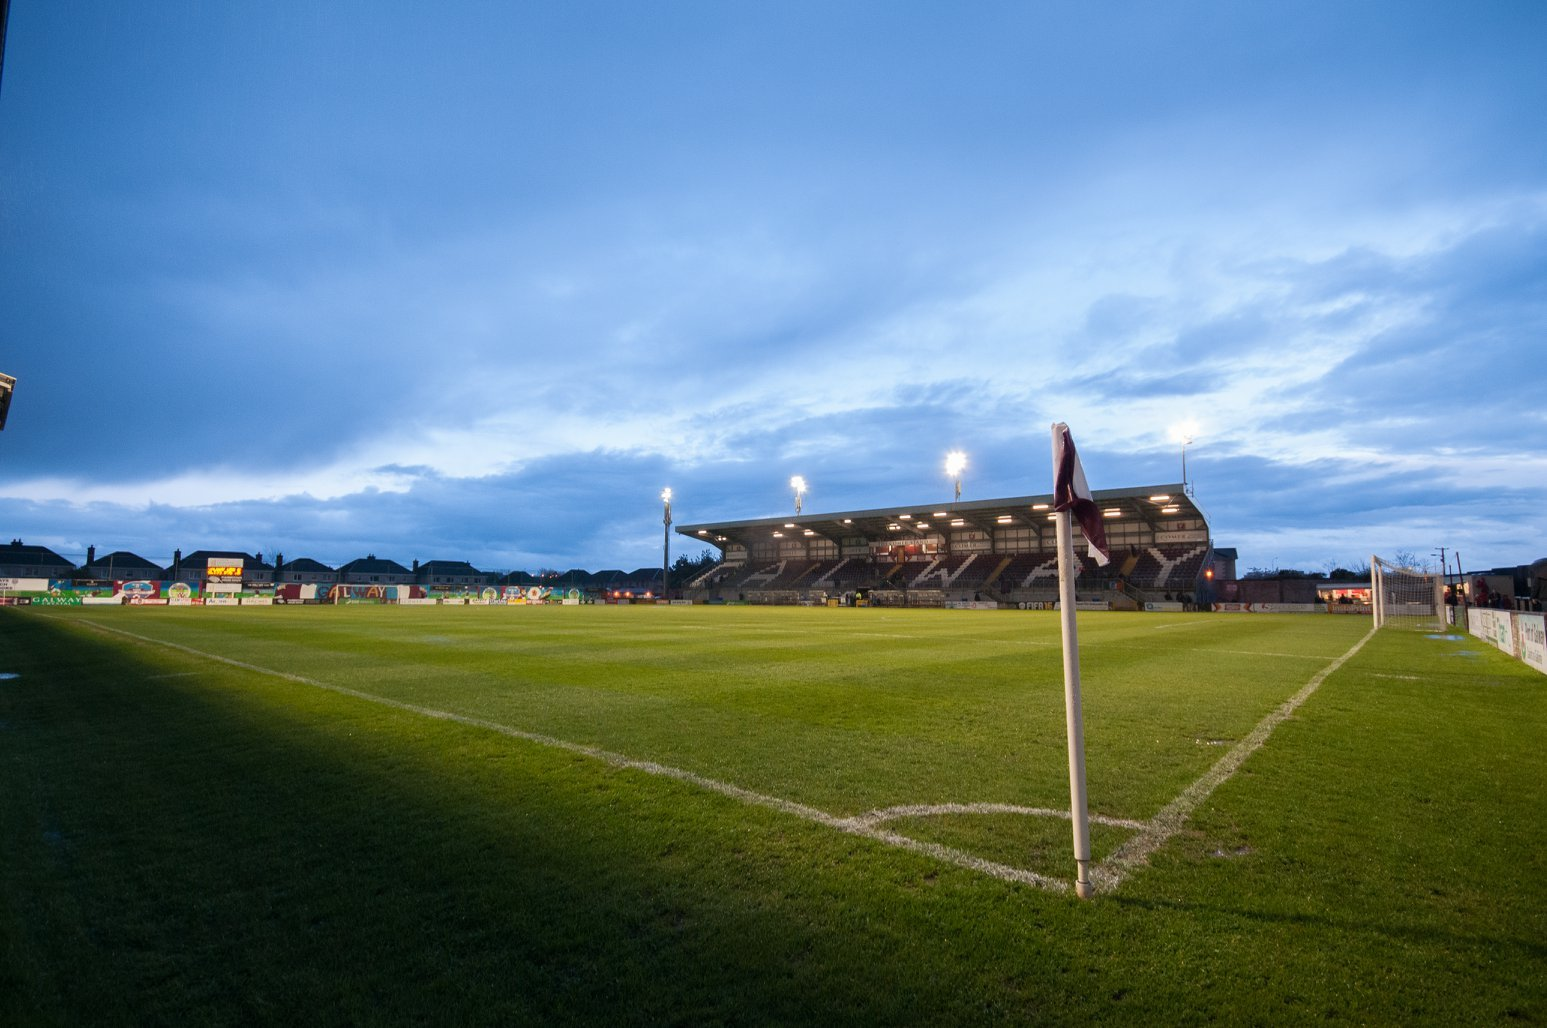 Galway United Stadium - Visit Galway